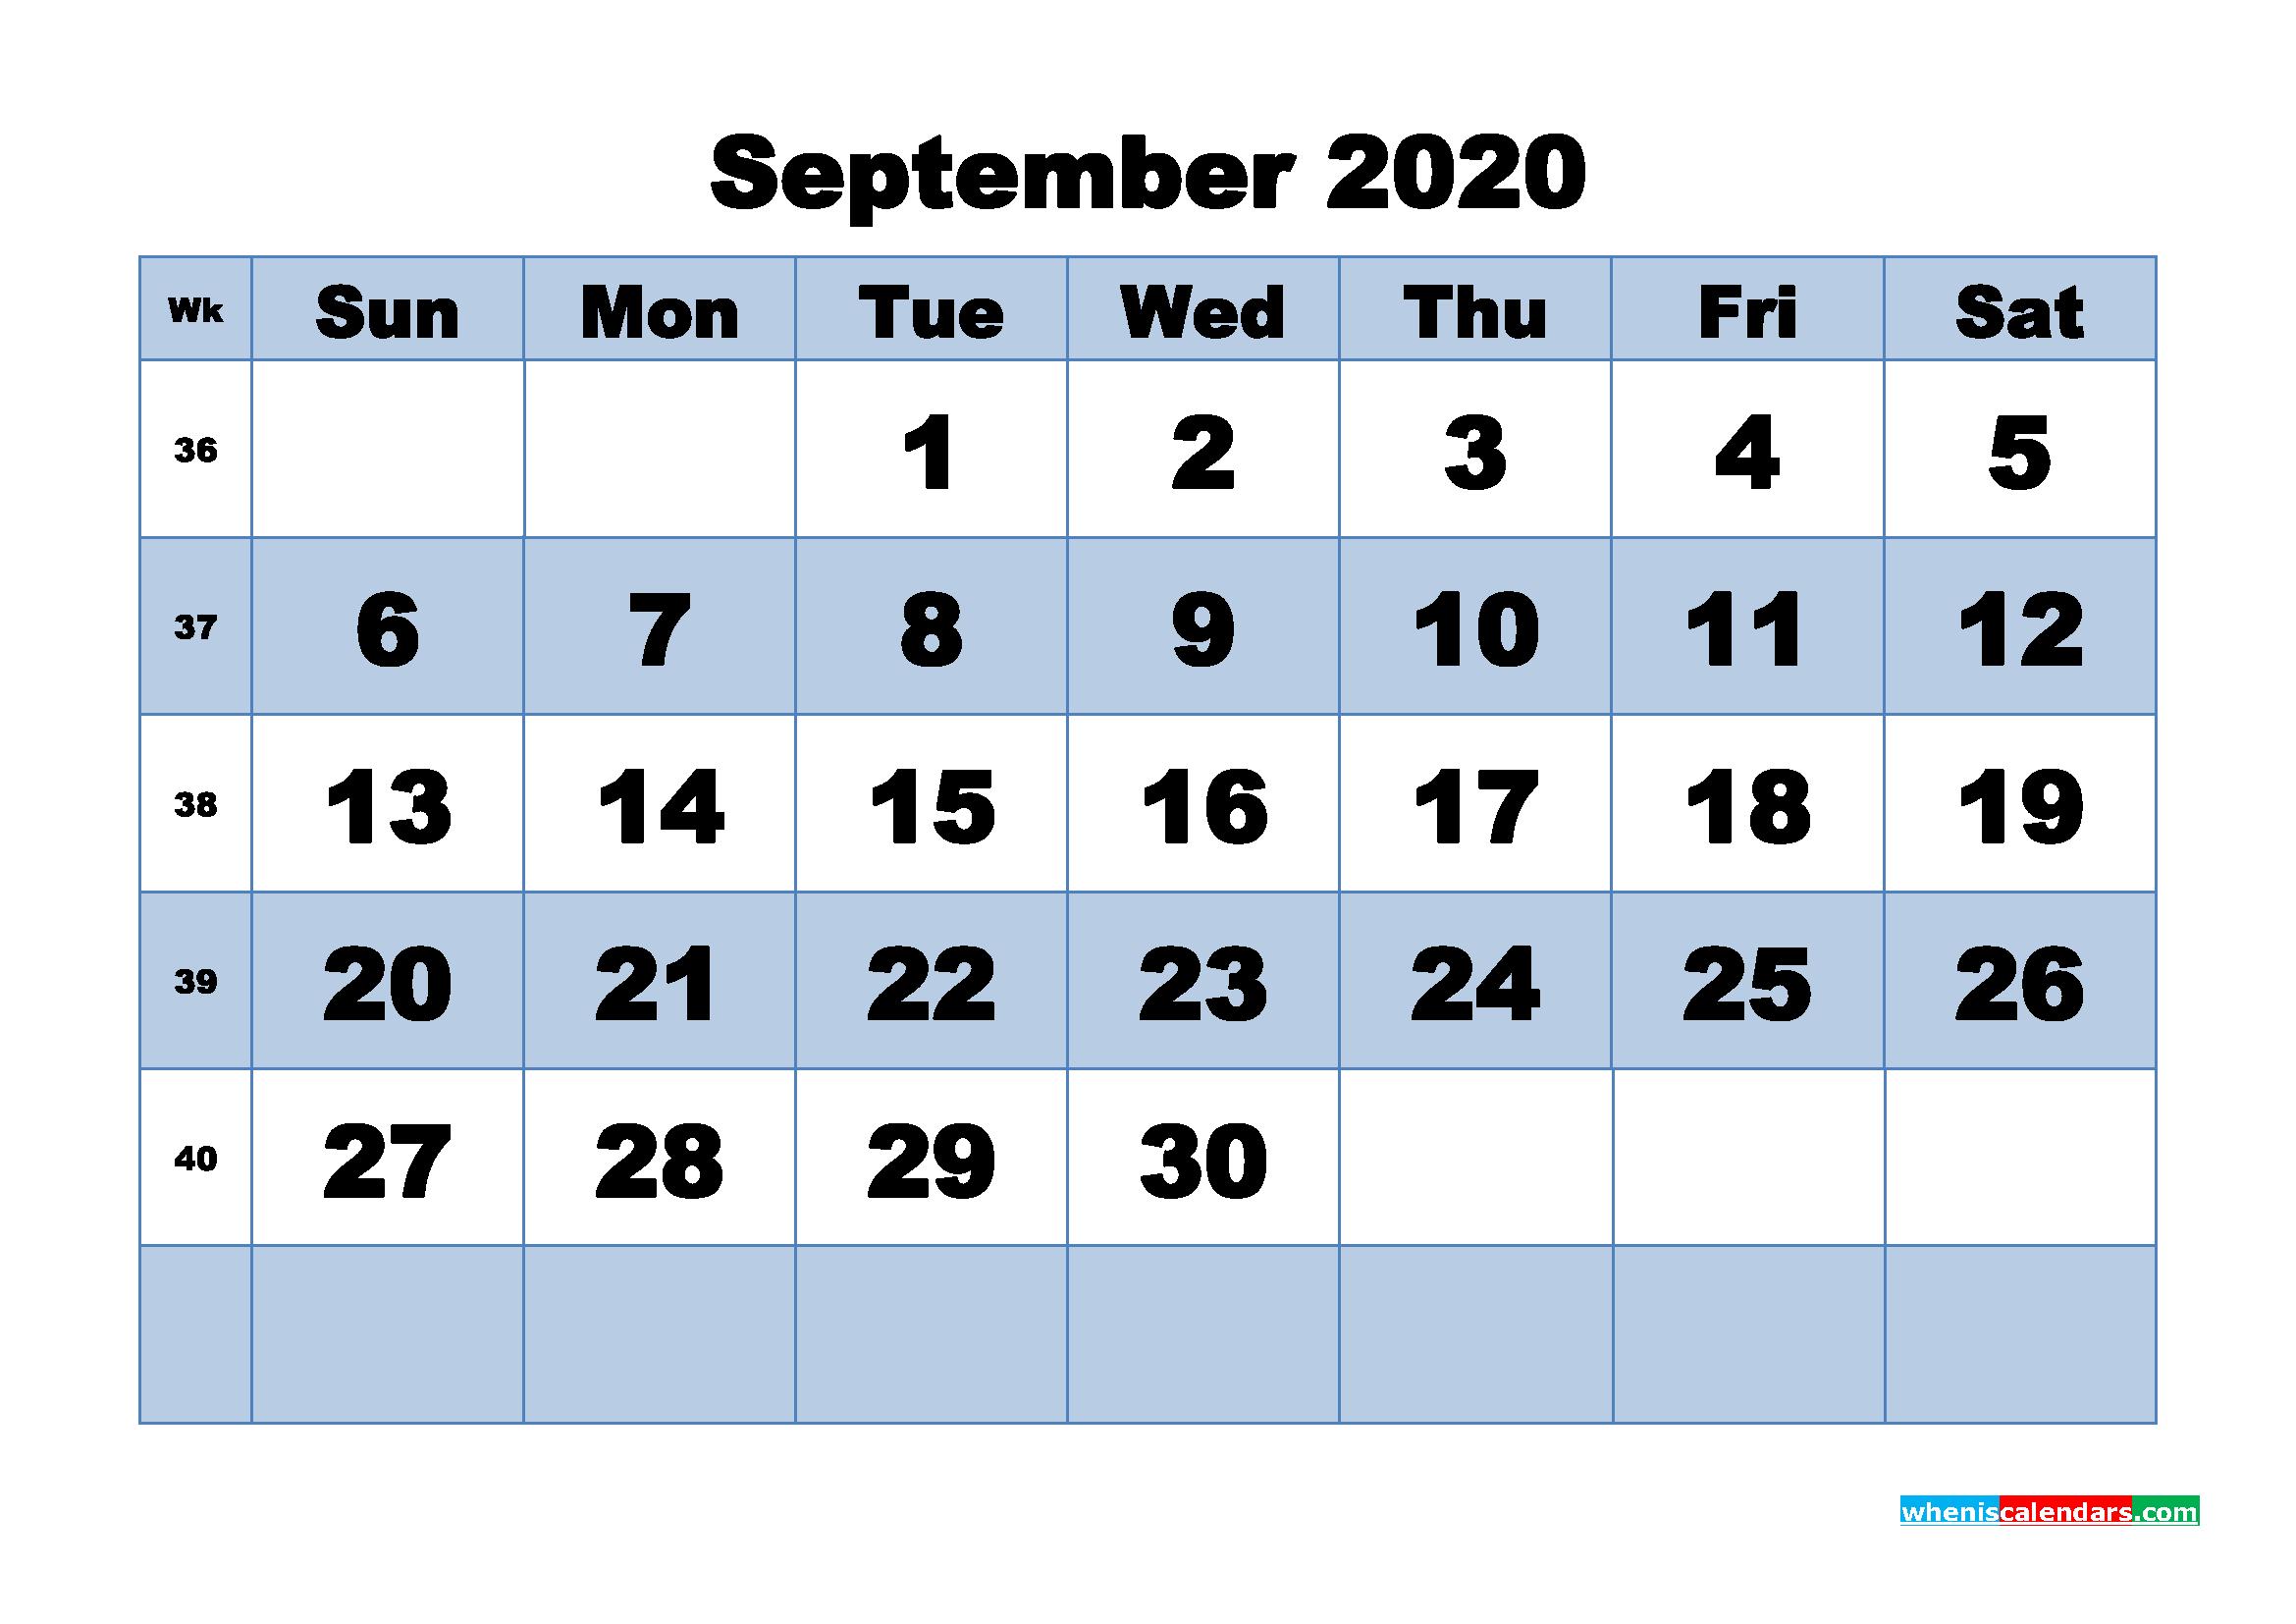 September Printable Calendar 2020 PDF, Word - No.m20b453